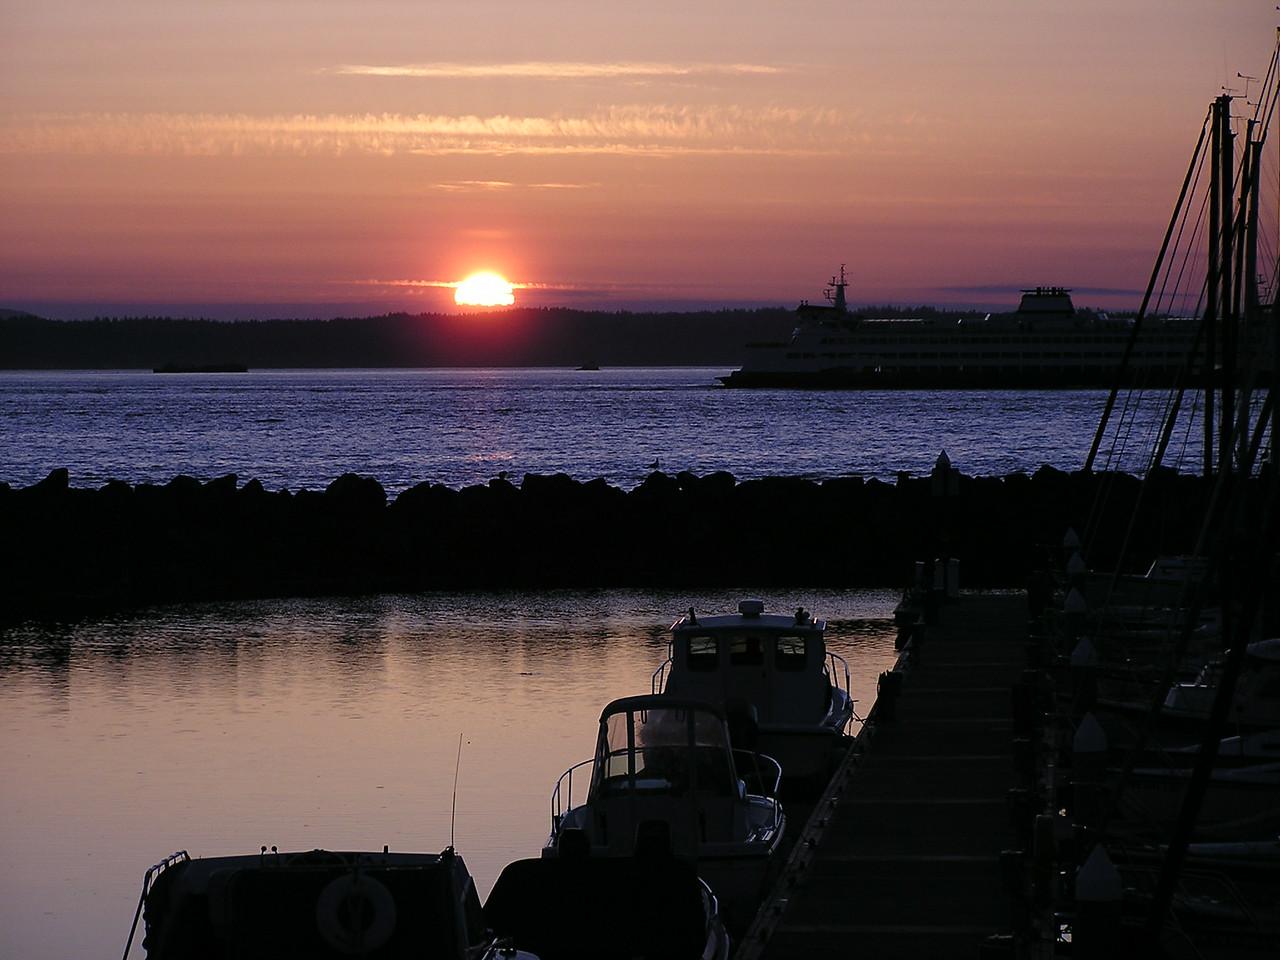 07 06 20 Sunset 007